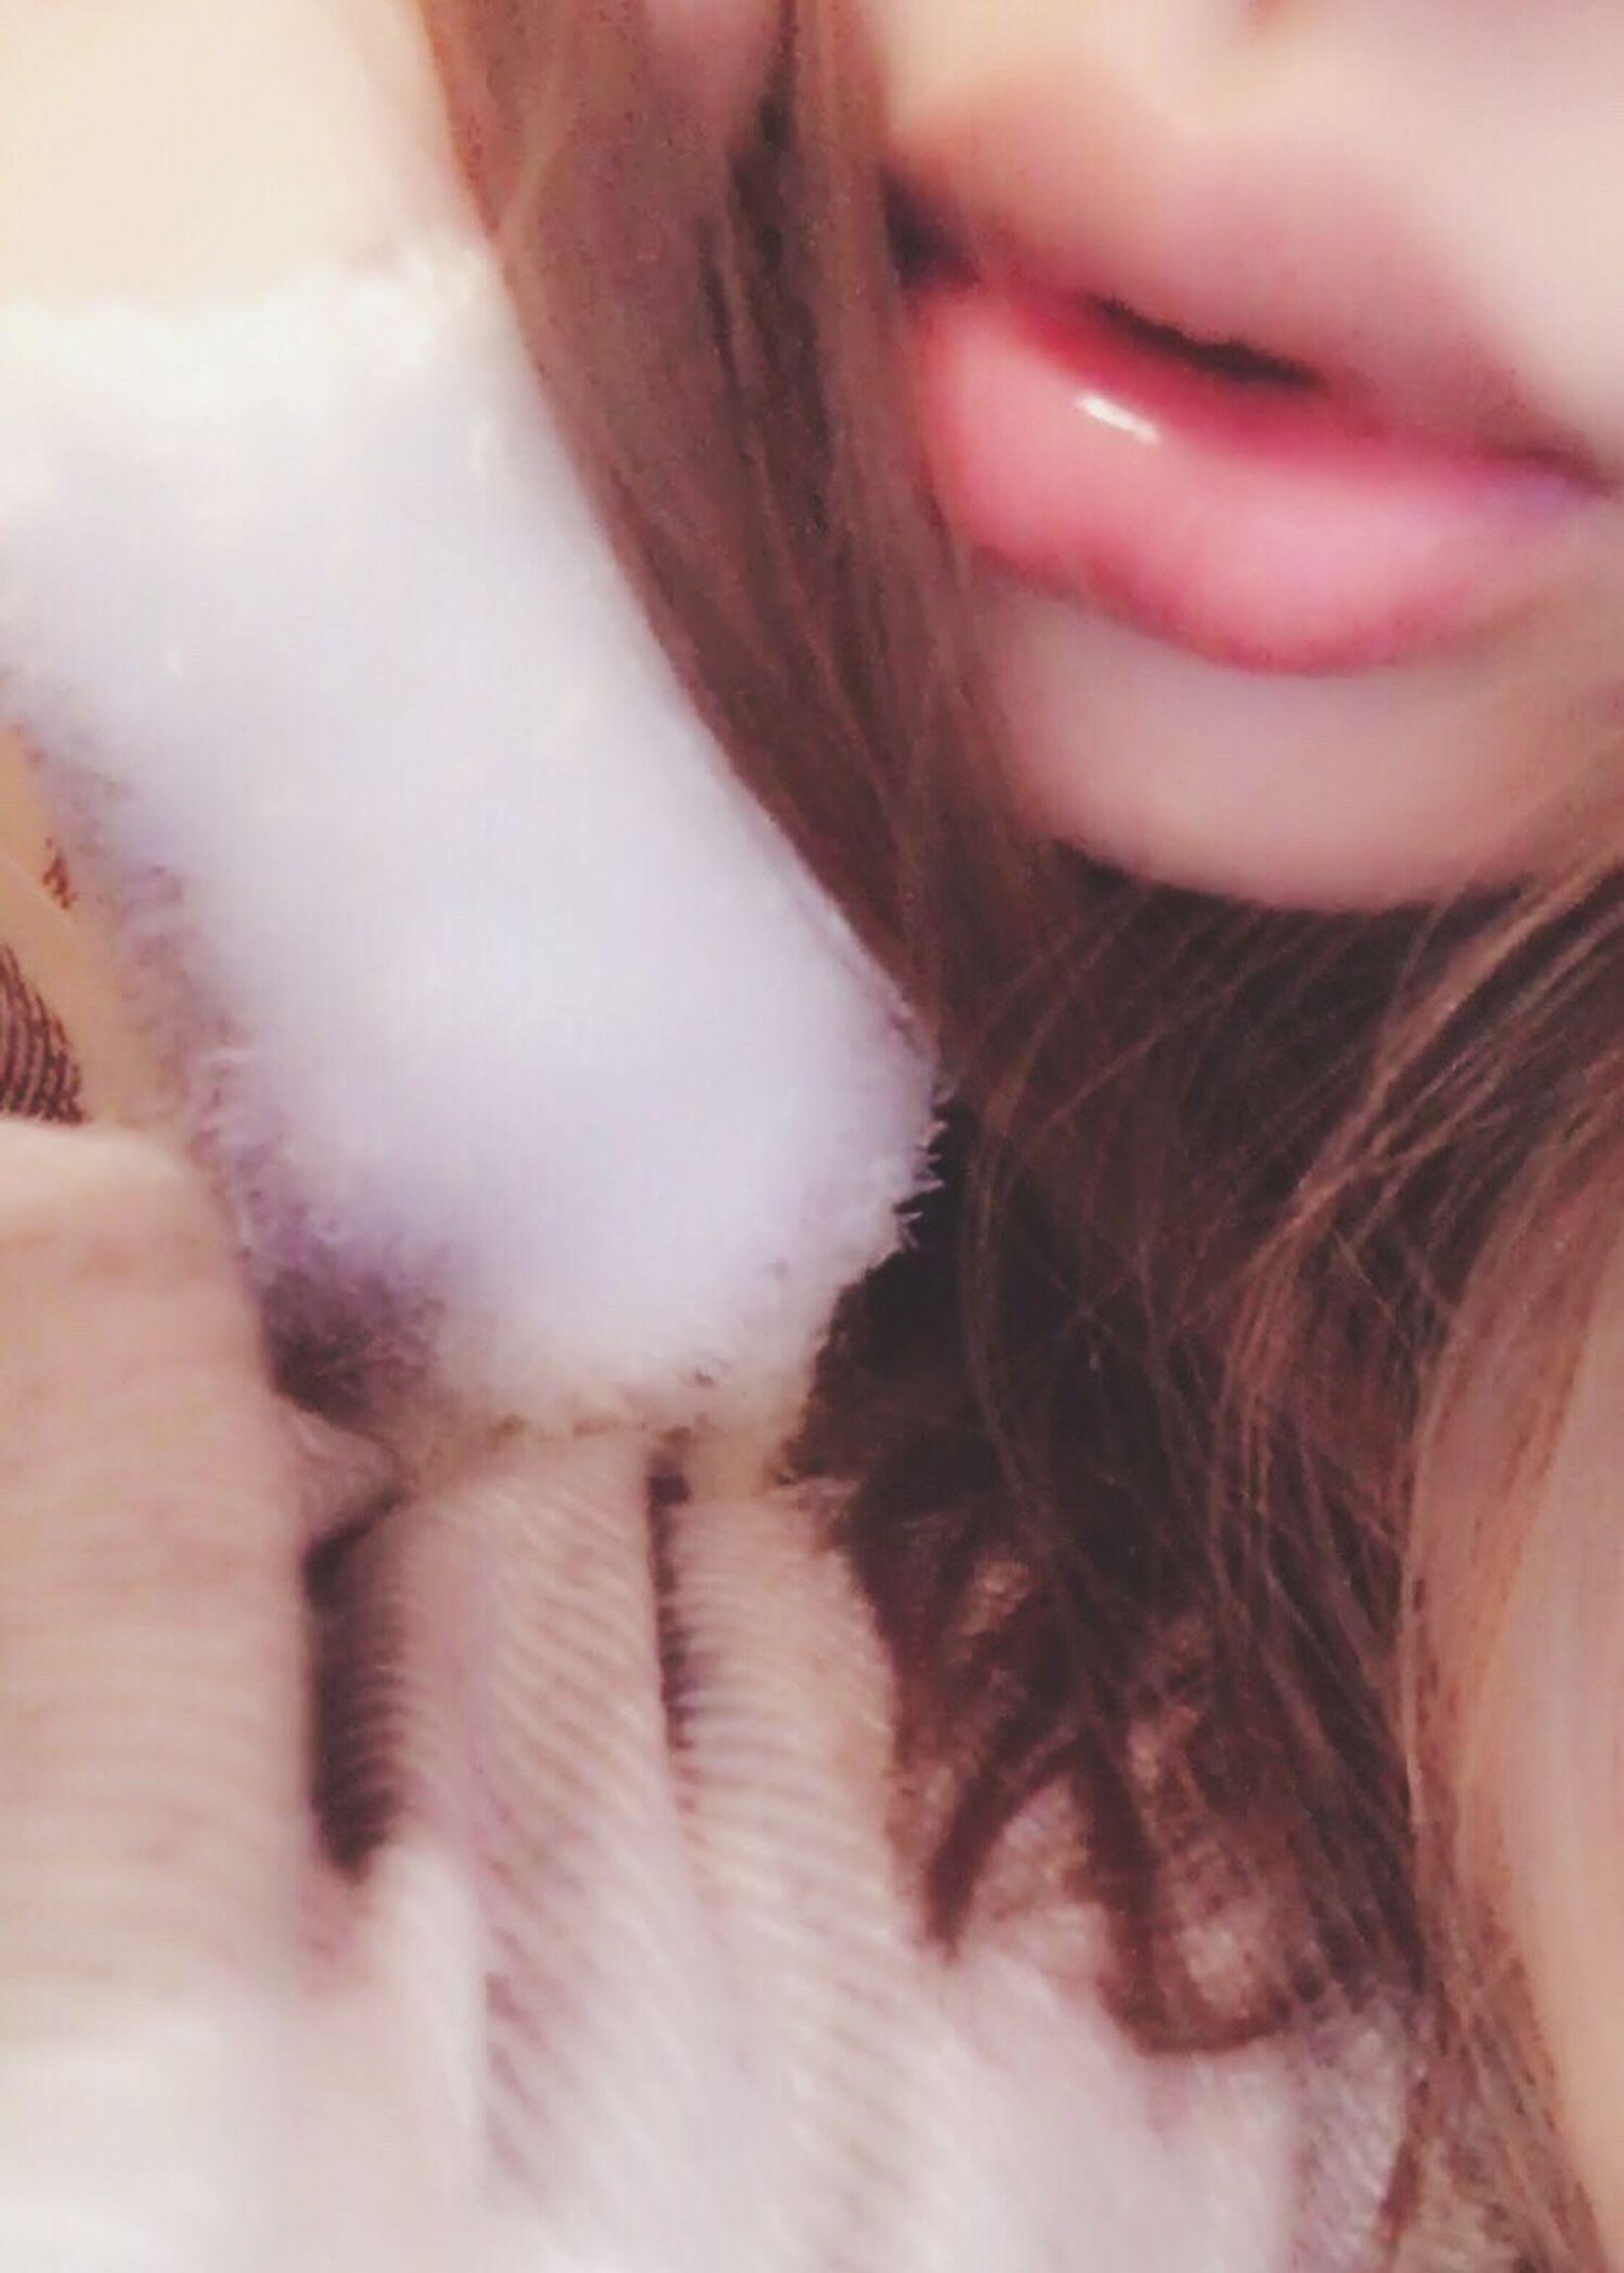 PhonePhotography EyeEm Best Shots Eye4photography  Japan Photography From My Point Of View Japanese Girl Selfies Self Portrait Happyhalloween ♡ Good Morning よく寝た ねむたい